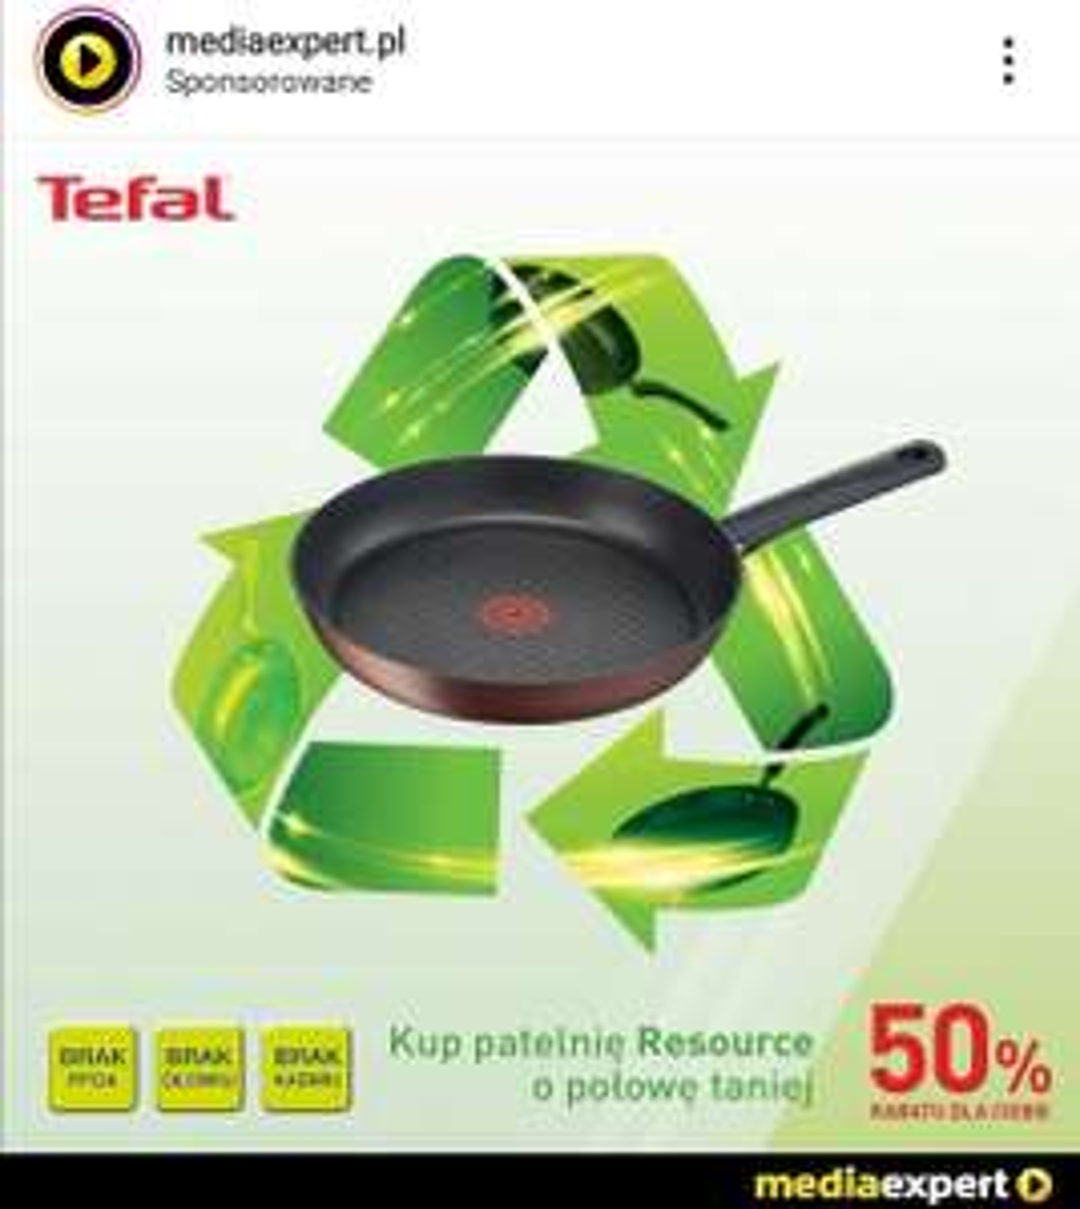 Patelnie TEFAL Resource -50% Media Expert